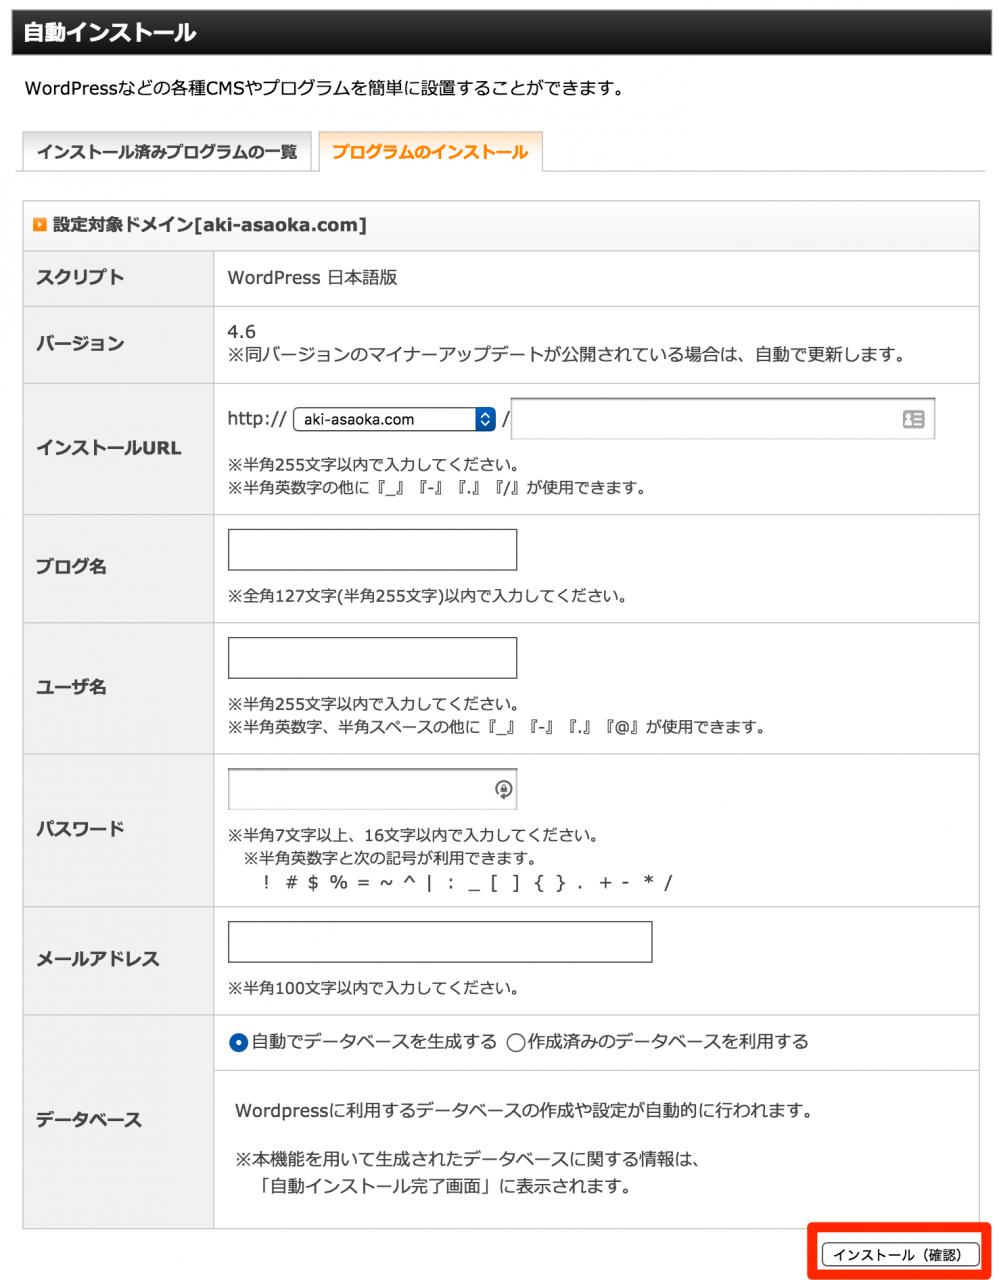 screencapture-secure-xserver-ne-jp-xserver-sv1302-1477180360753